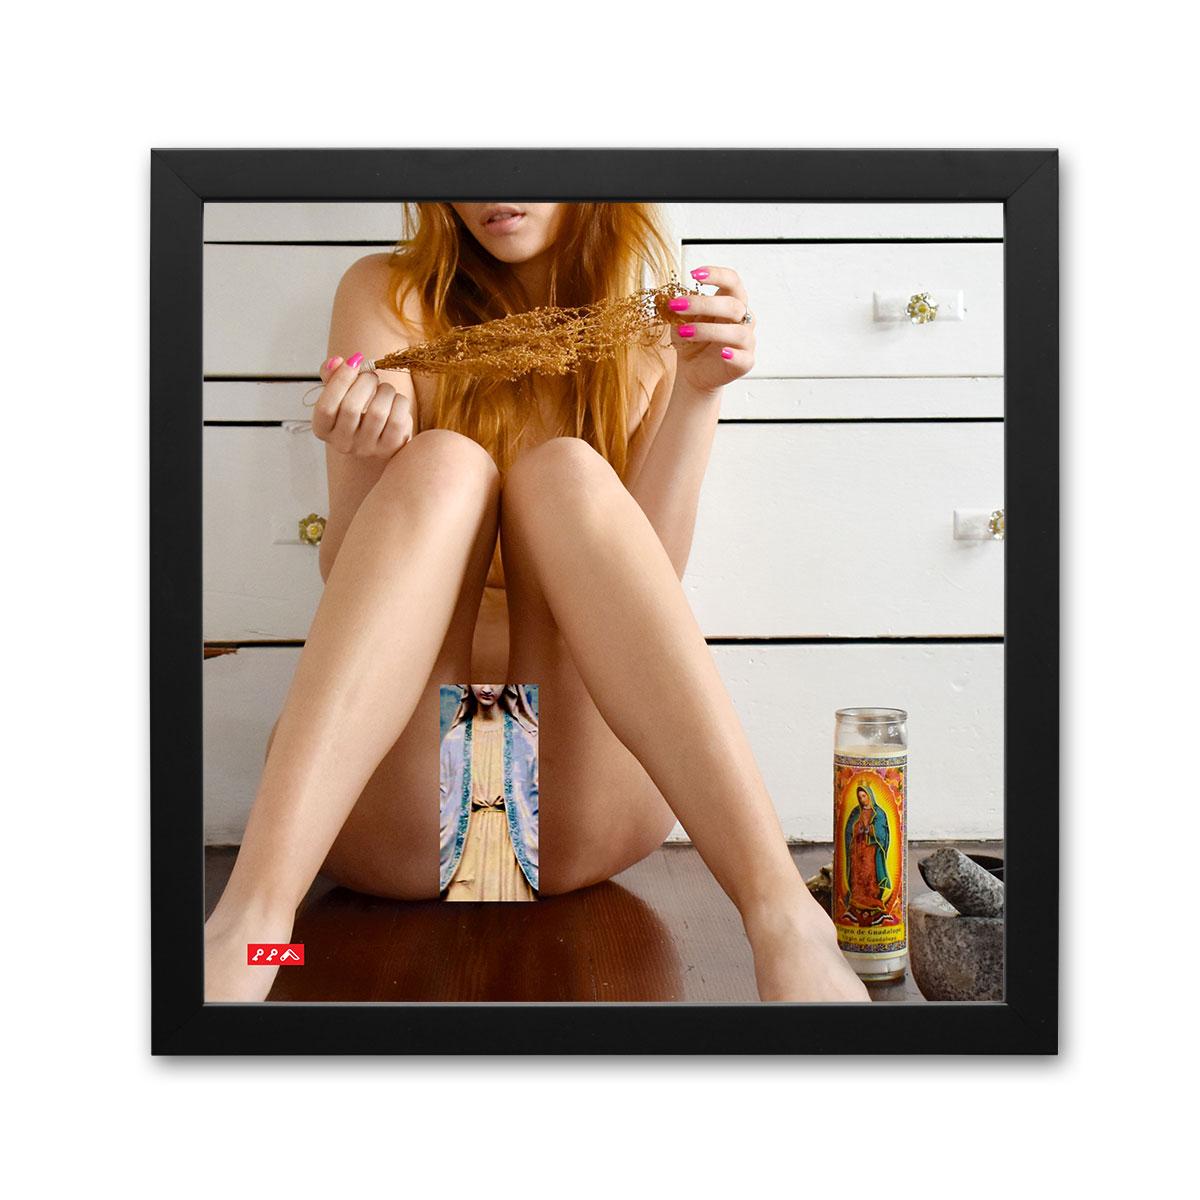 PRAY FOR US SINNERS kikicollage art nude coverup framed print by kiki honeycutt